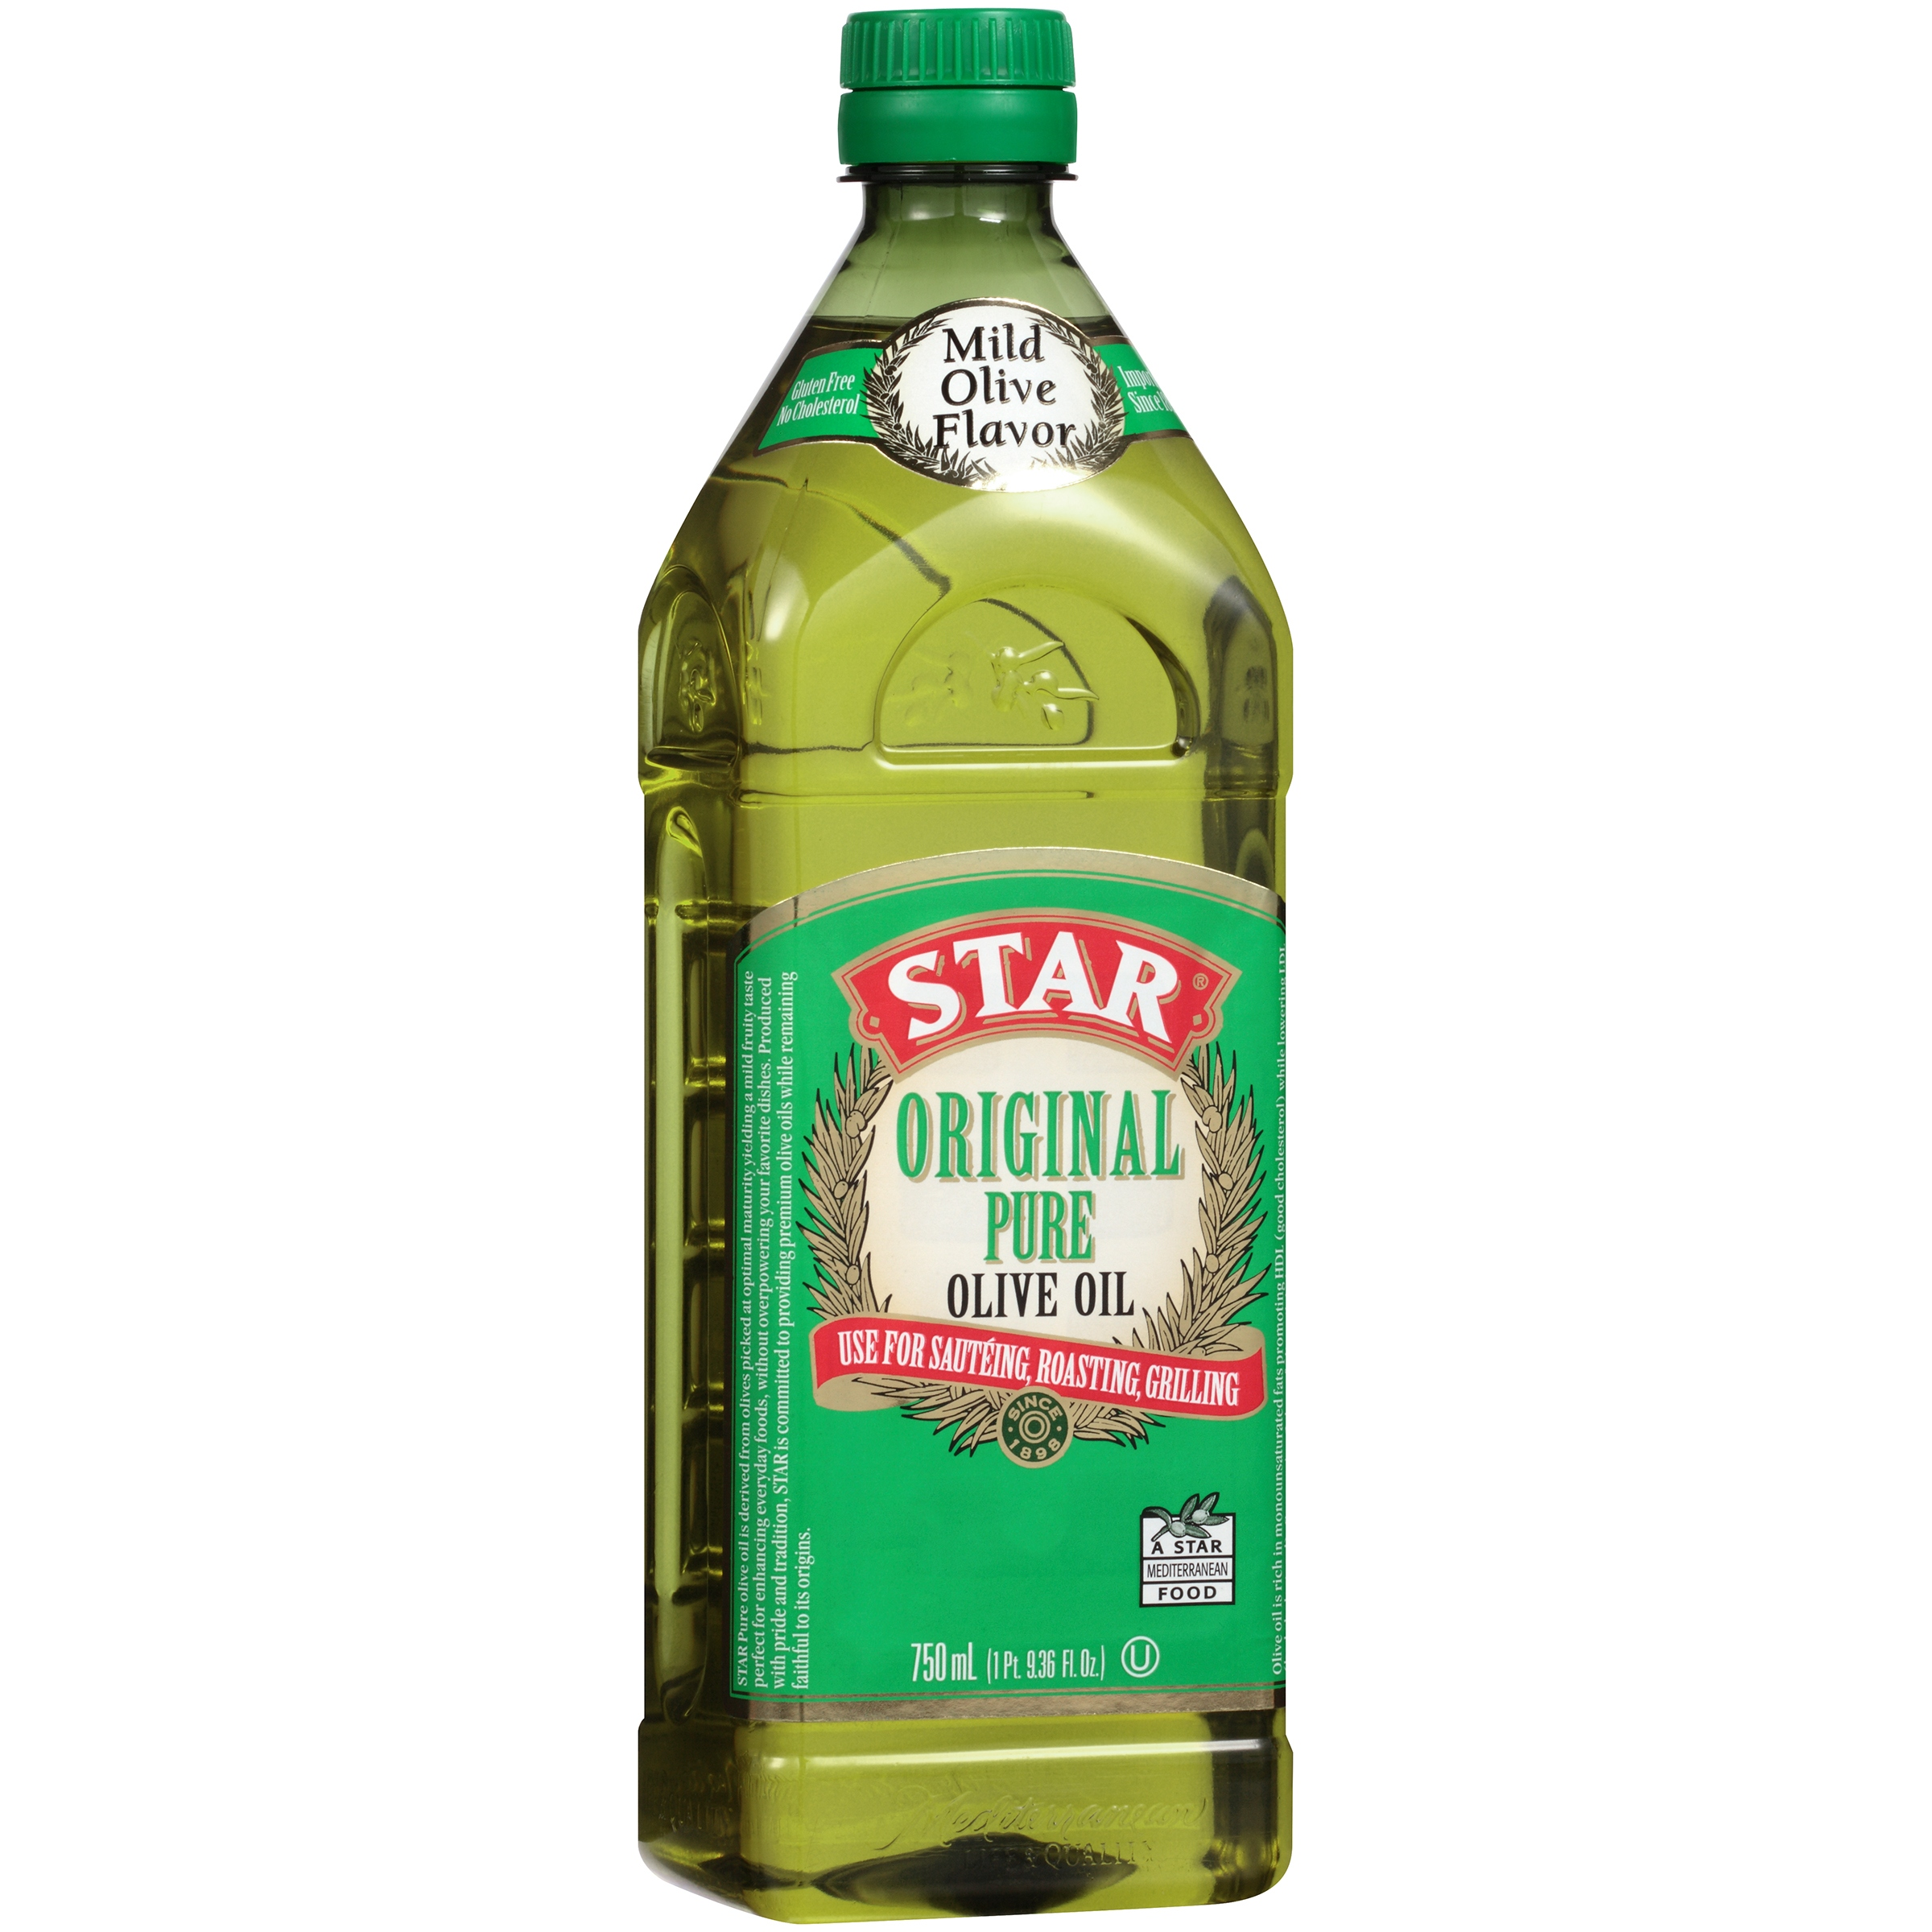 Star® Original Pure Olive Oil 750 mL Bottle